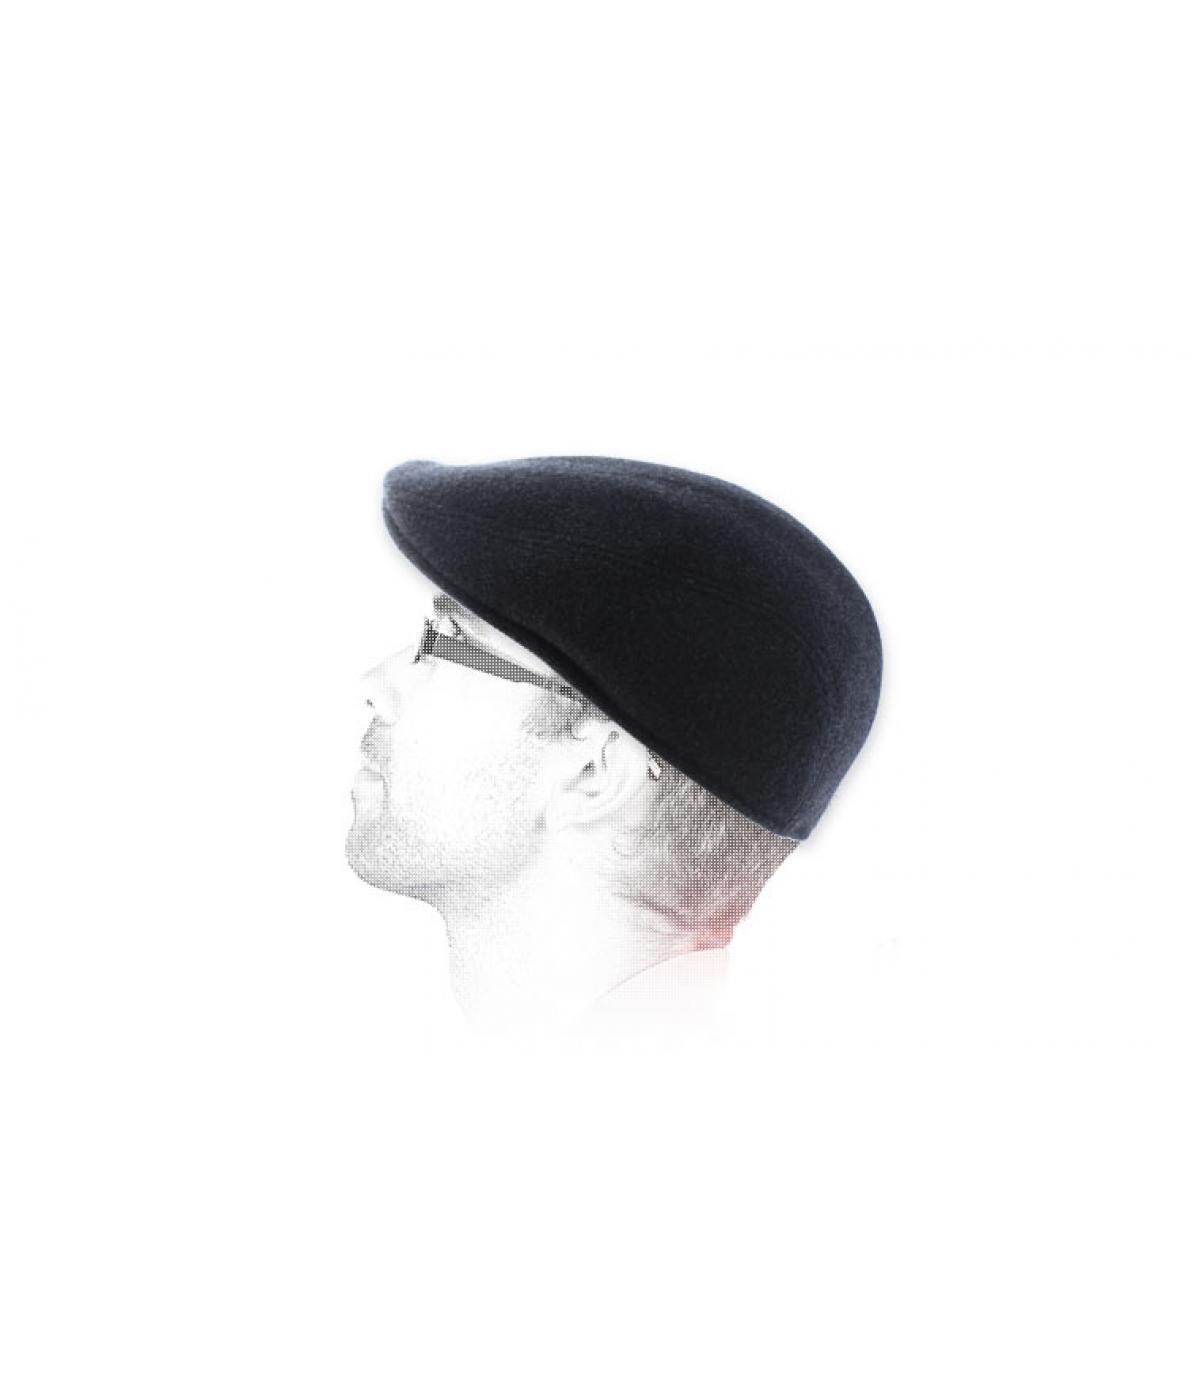 grijs baret